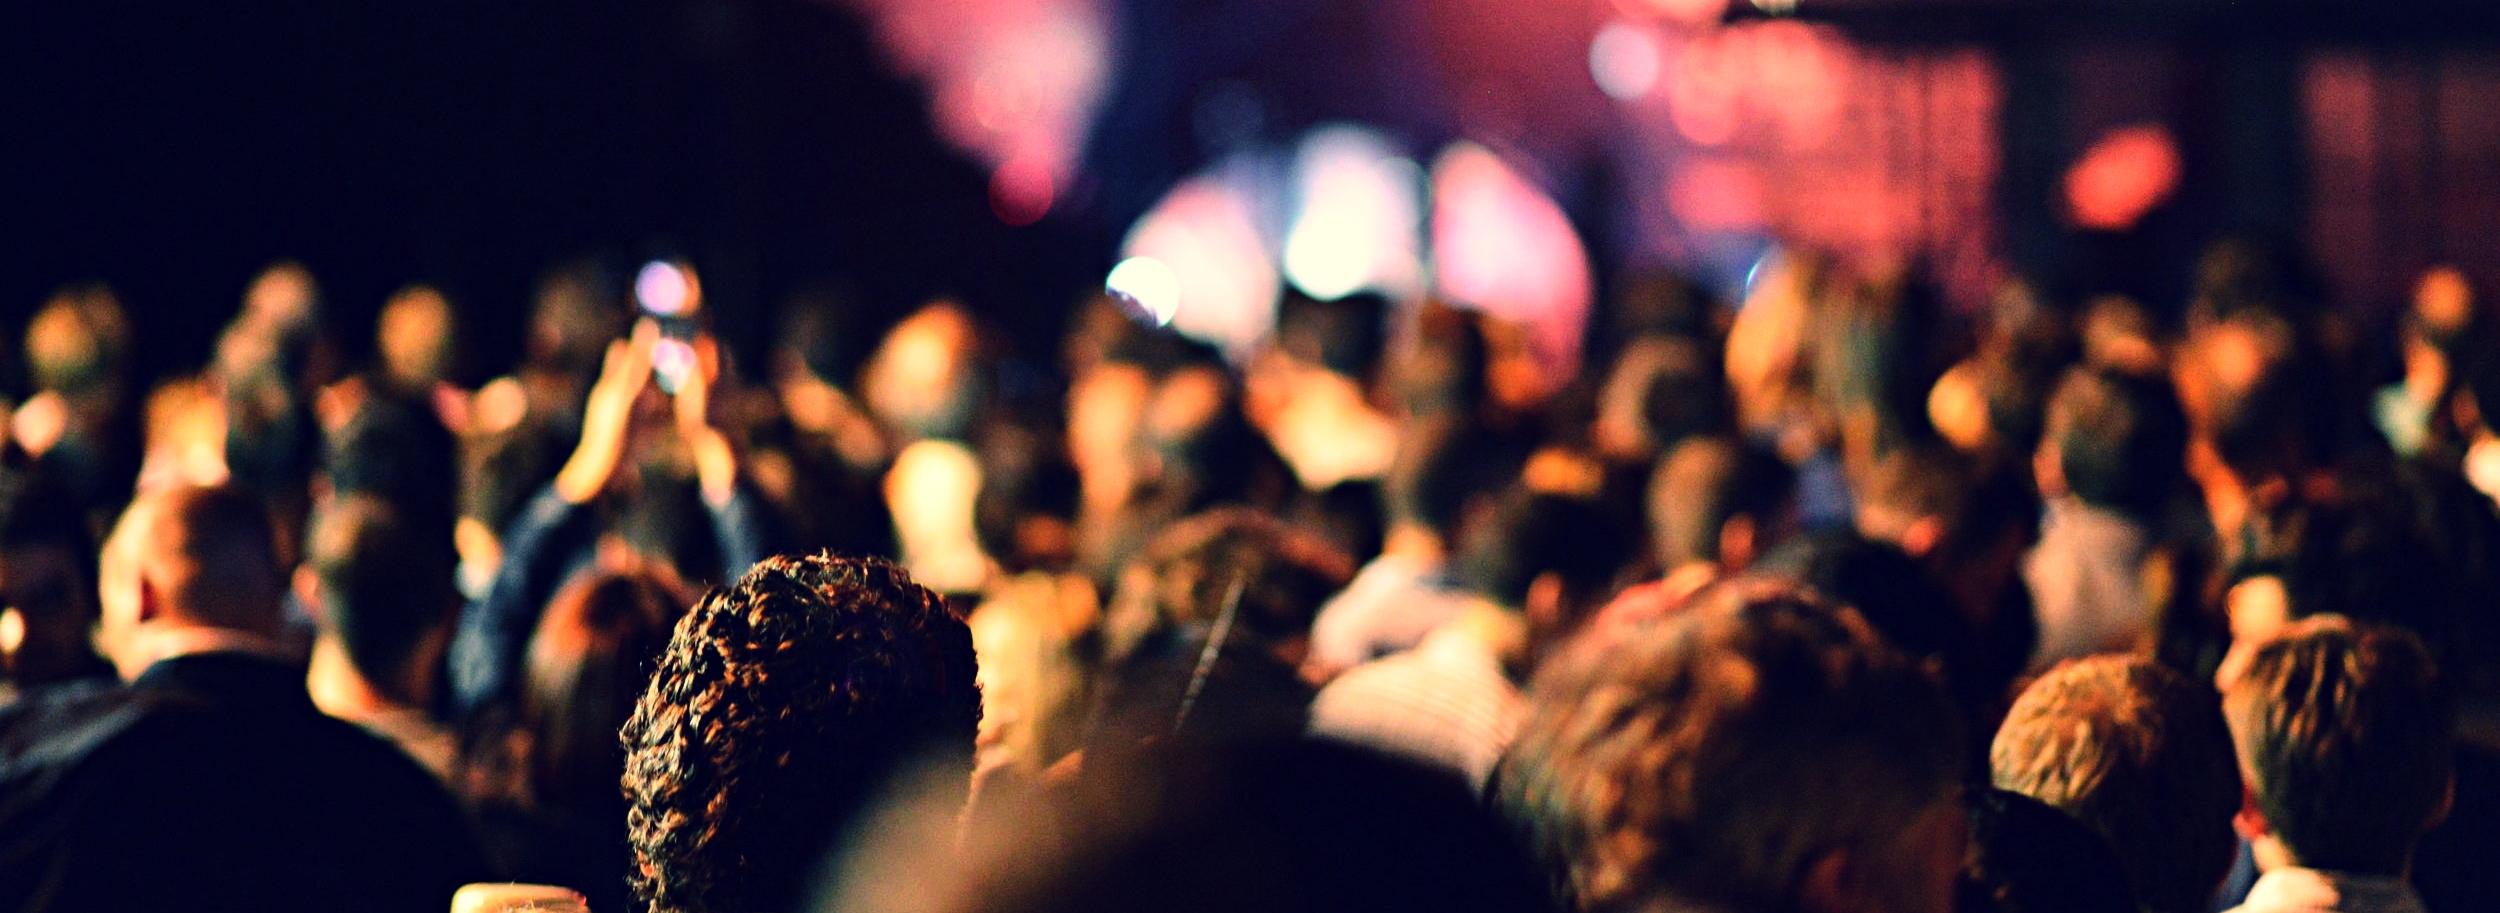 blur-community-crowd-5156.jpg